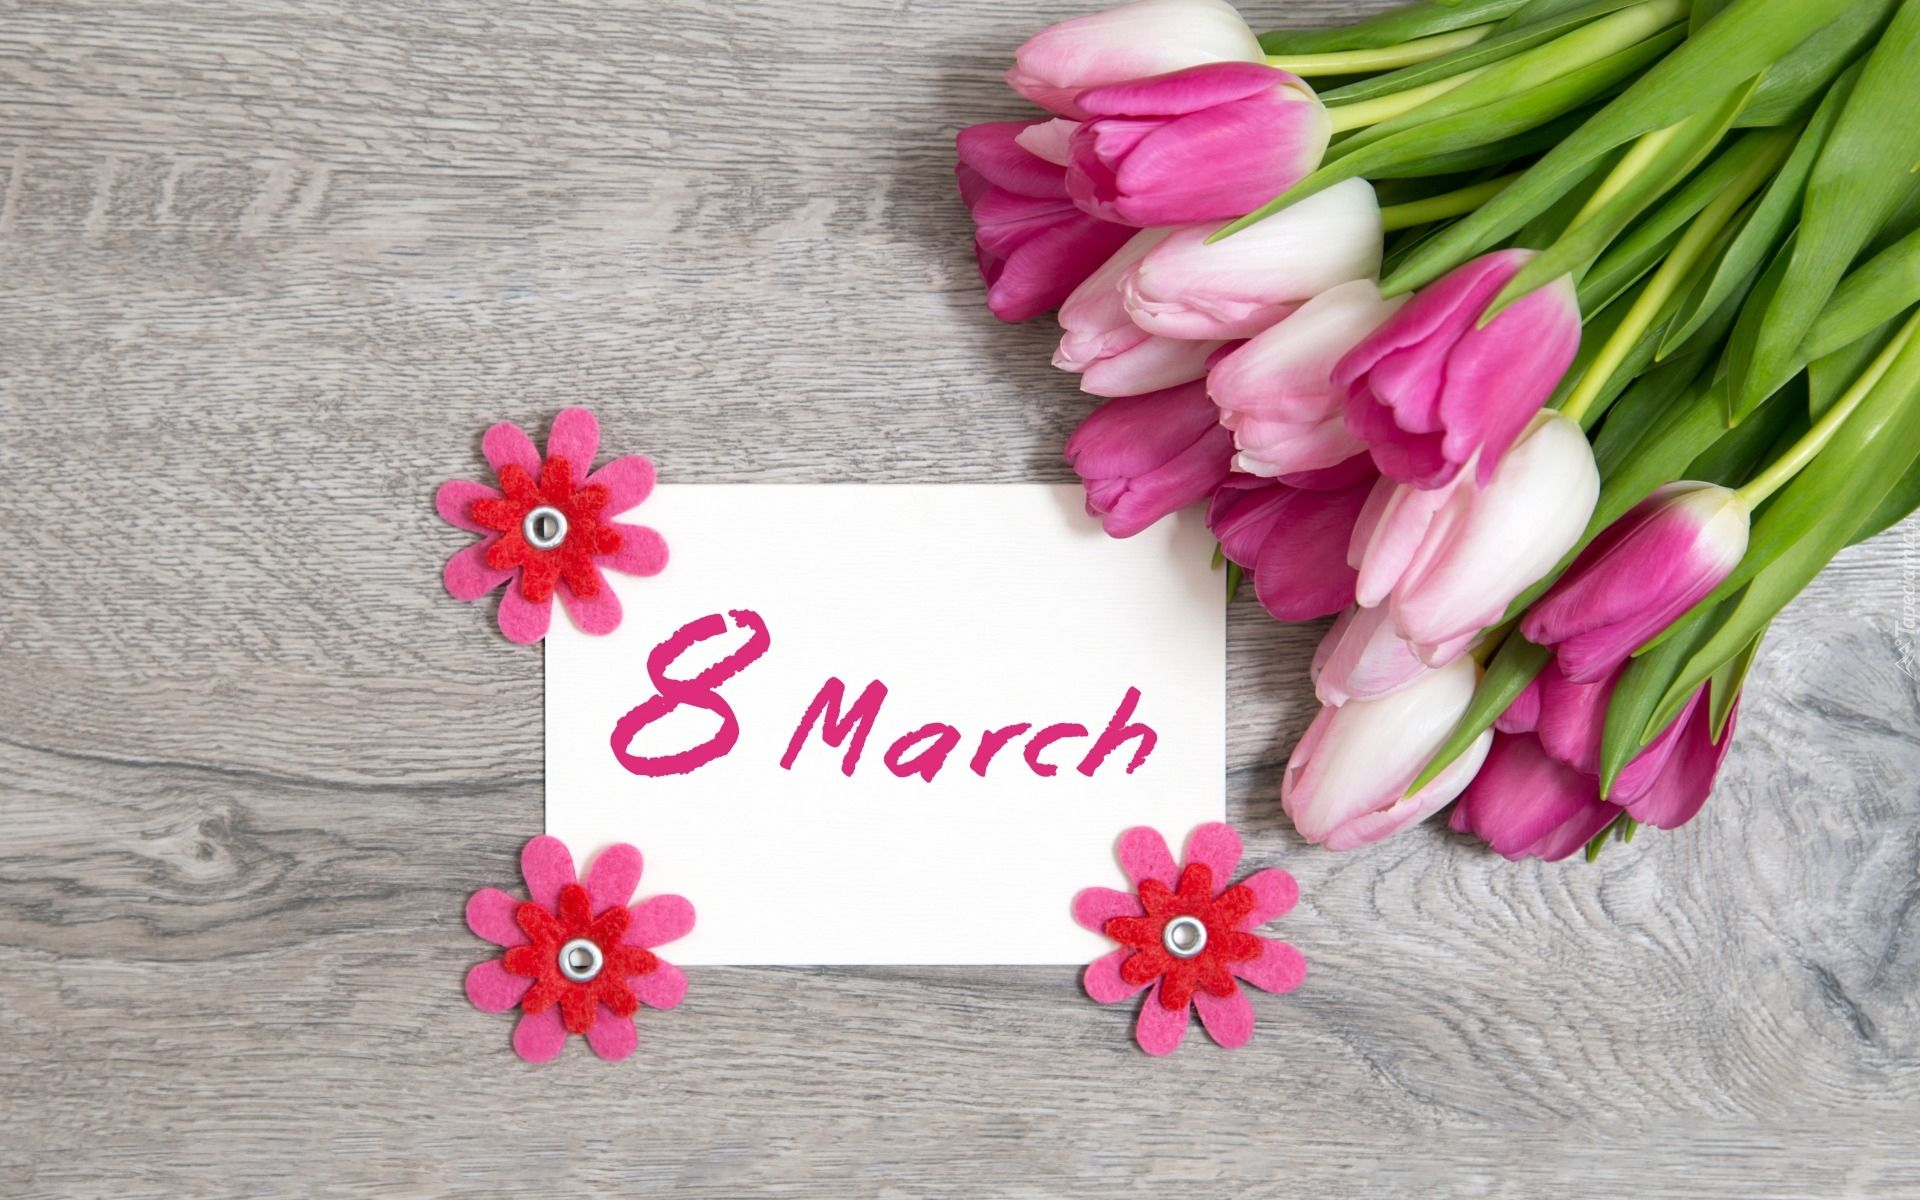 Tulipany Kartka Napis 8 March Deski Dzien Kobiet 8th Of March Holiday Wallpaper Women S Day 8 March